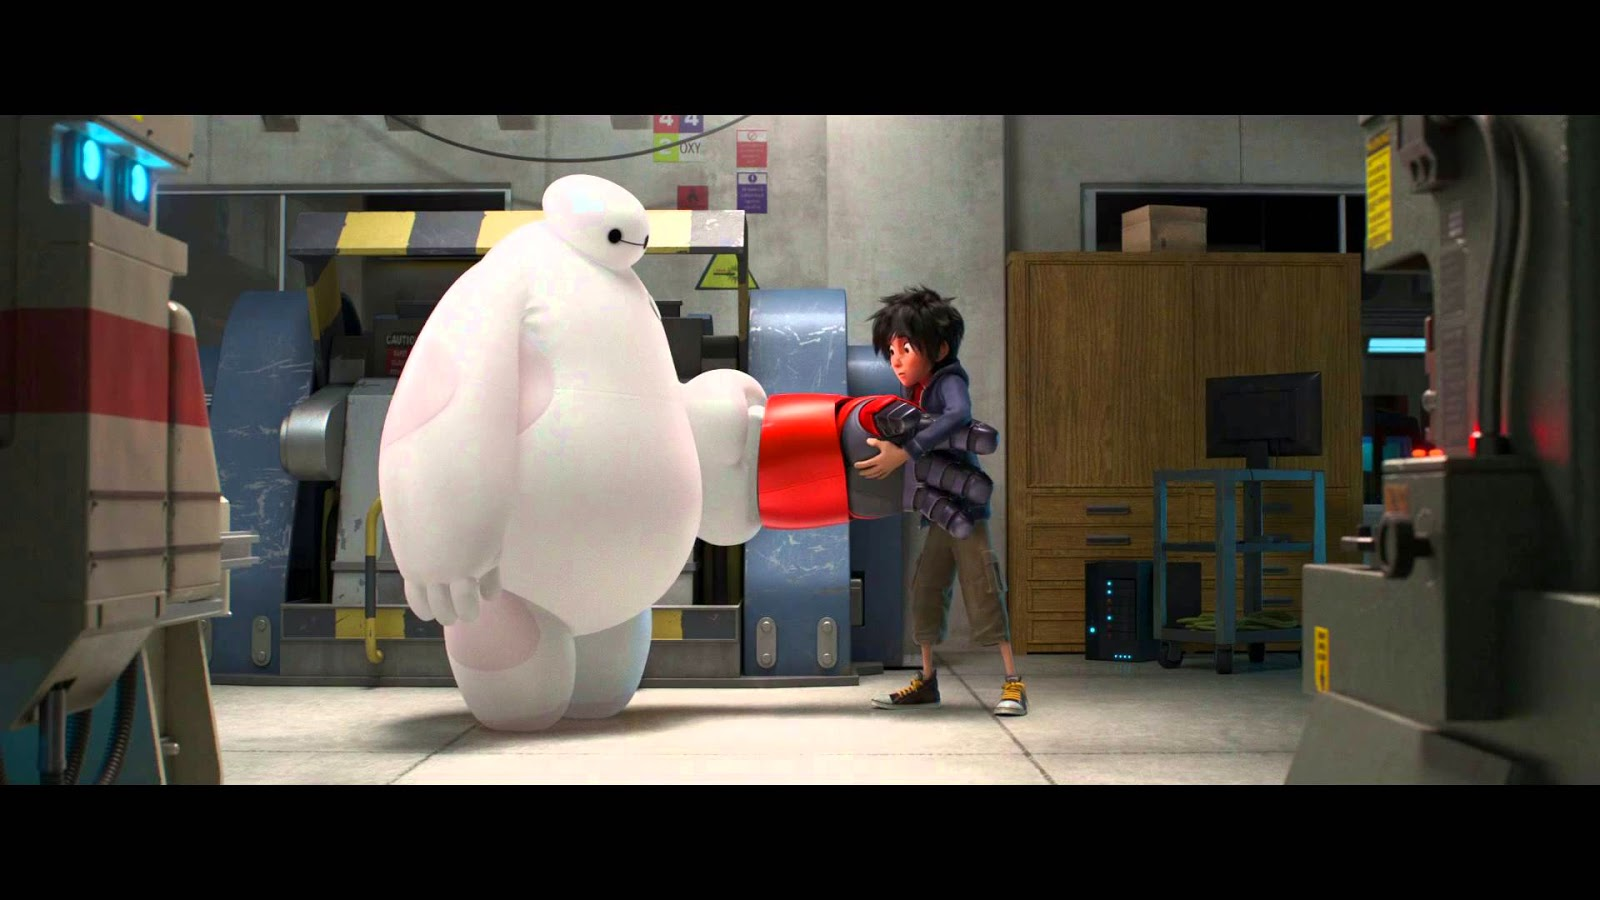 Big hero 6 film trailer